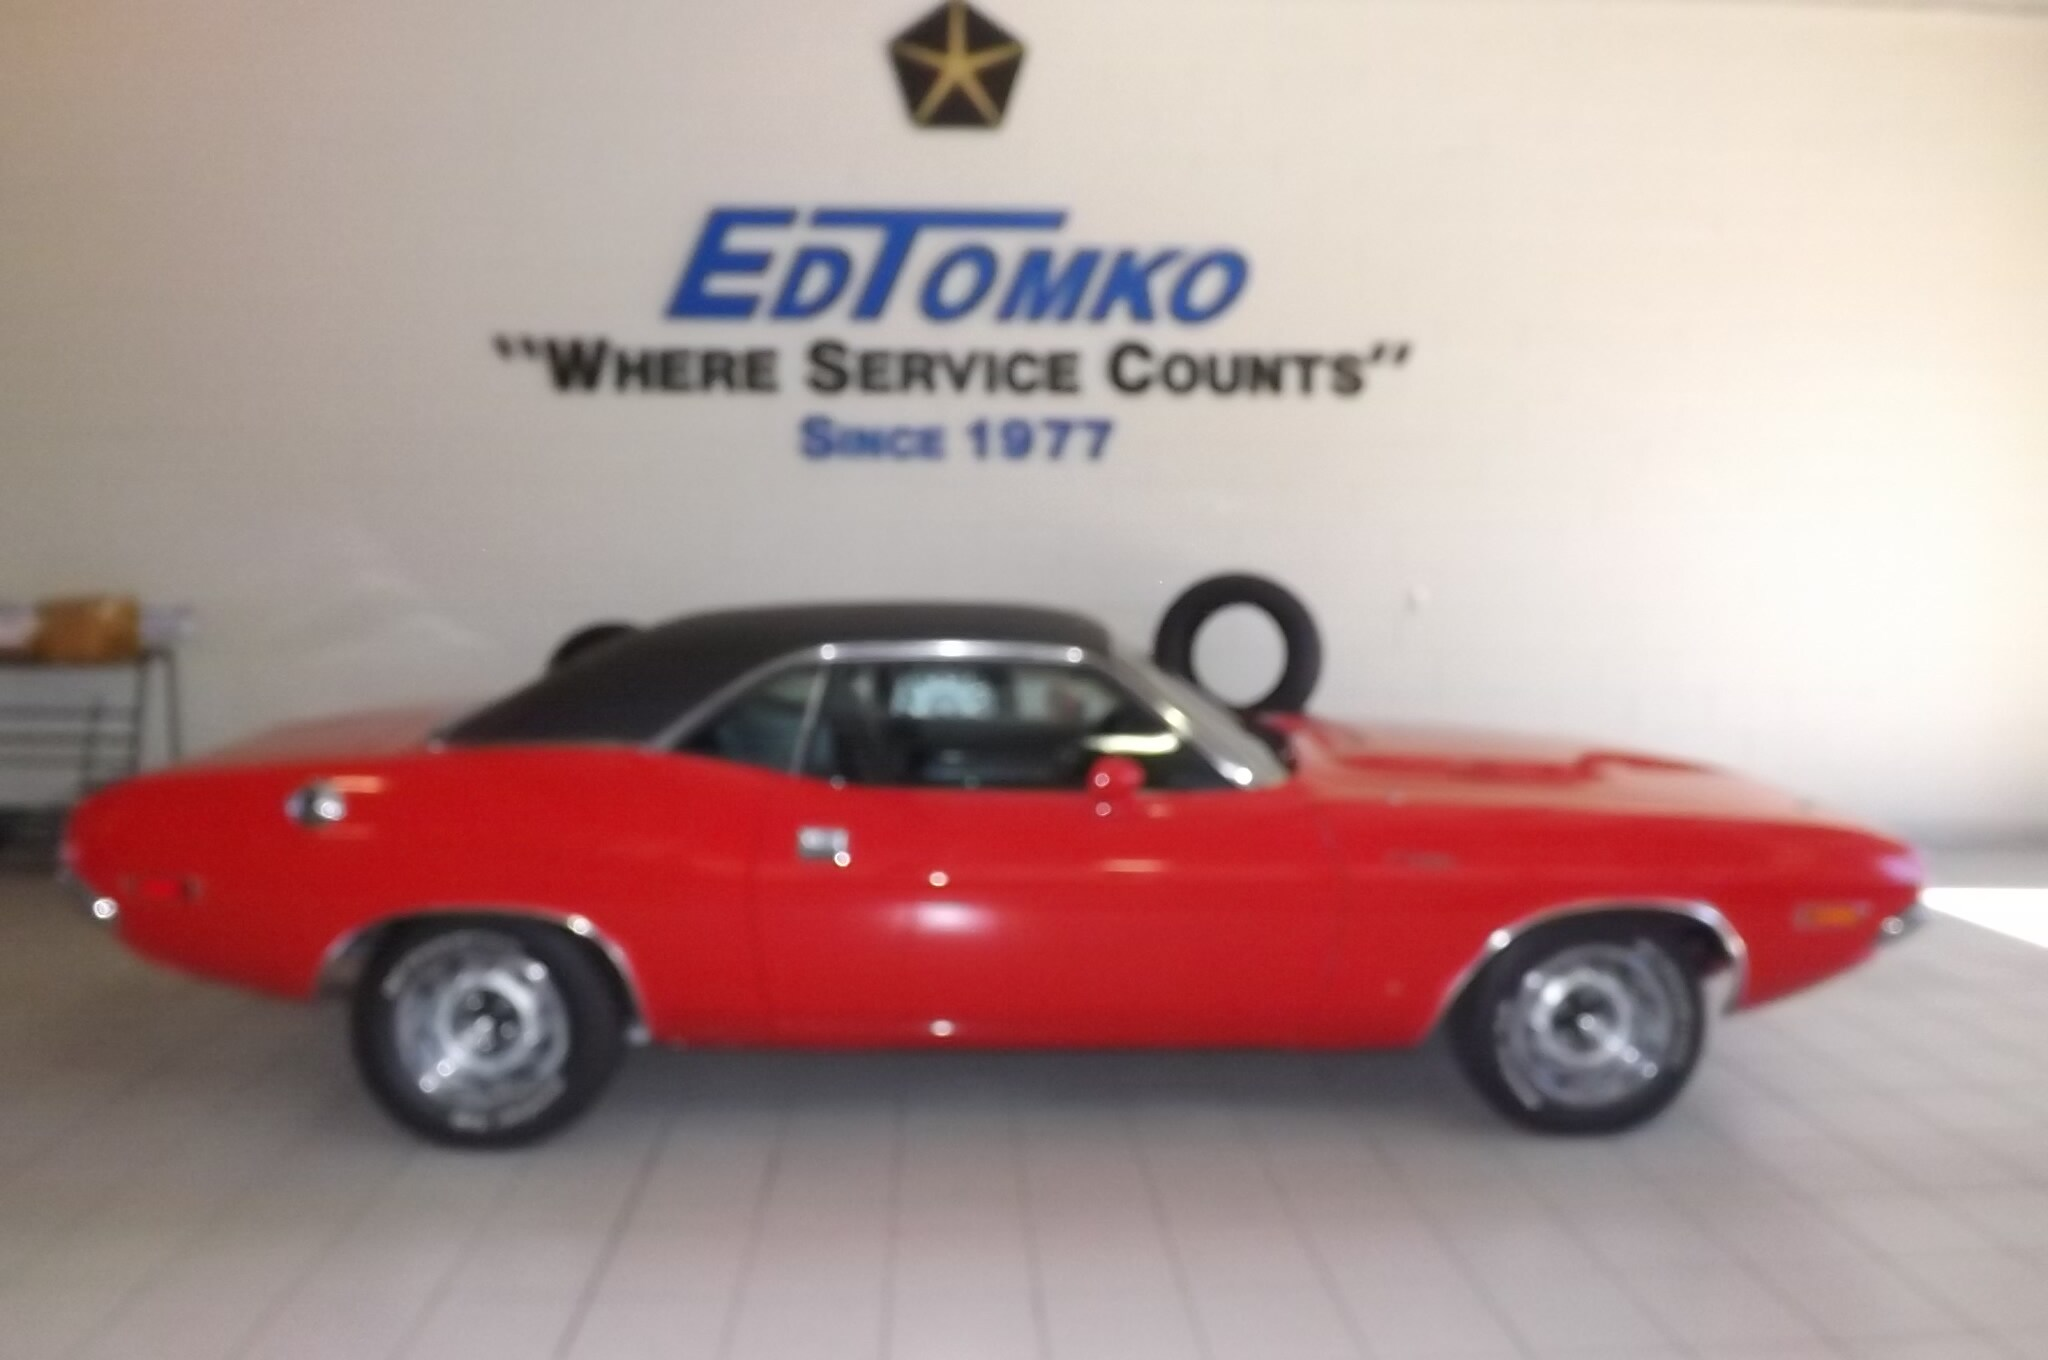 Classic Cars at Ed Tomko Chrysler Jeep Dodge in Avon Lake Ohio ...